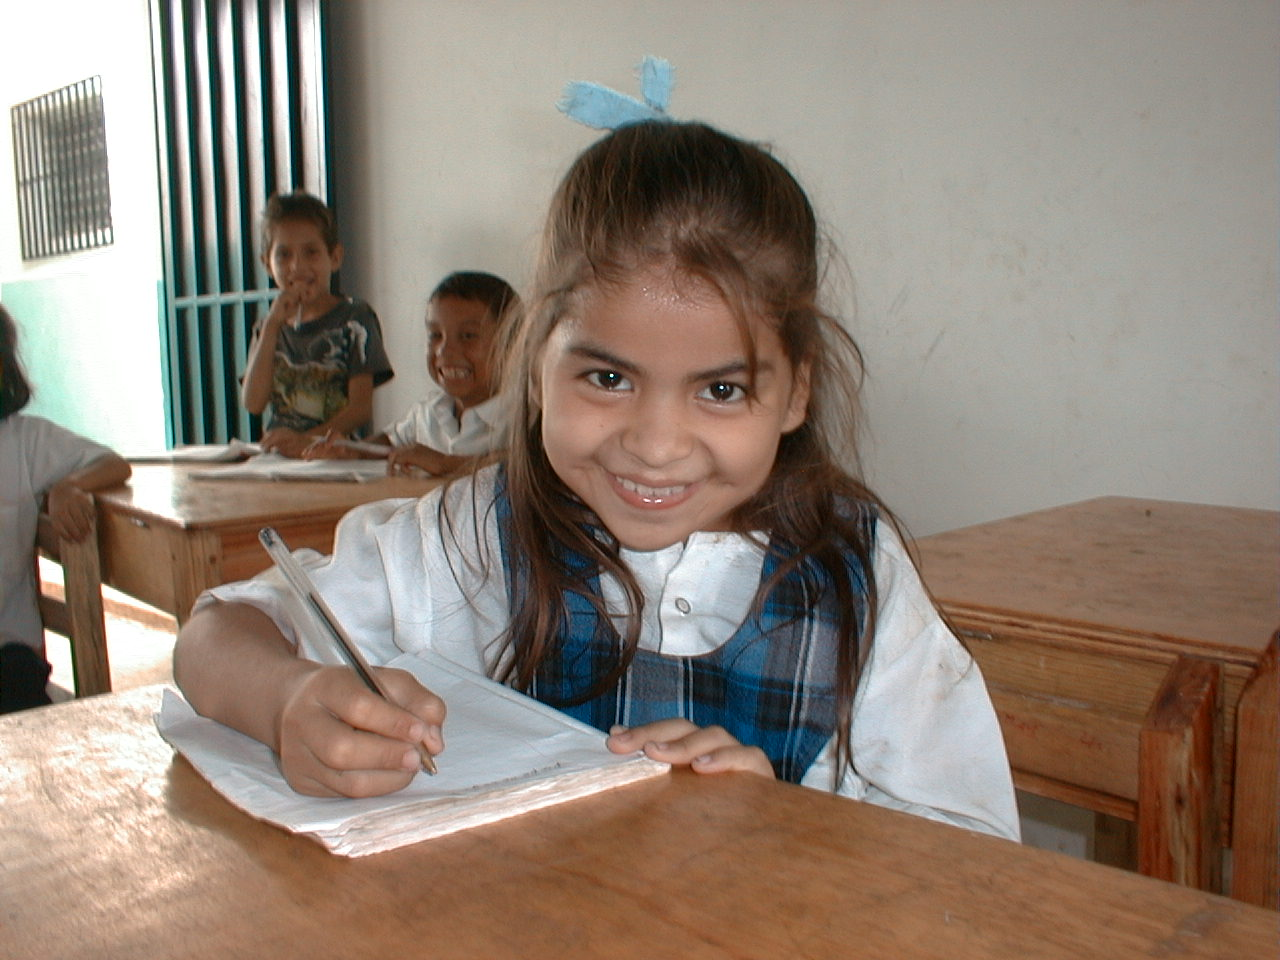 http://commons.wikimedia.org/wiki/File:Honduras_San_Ramon_Choluteca_school_3.jpg